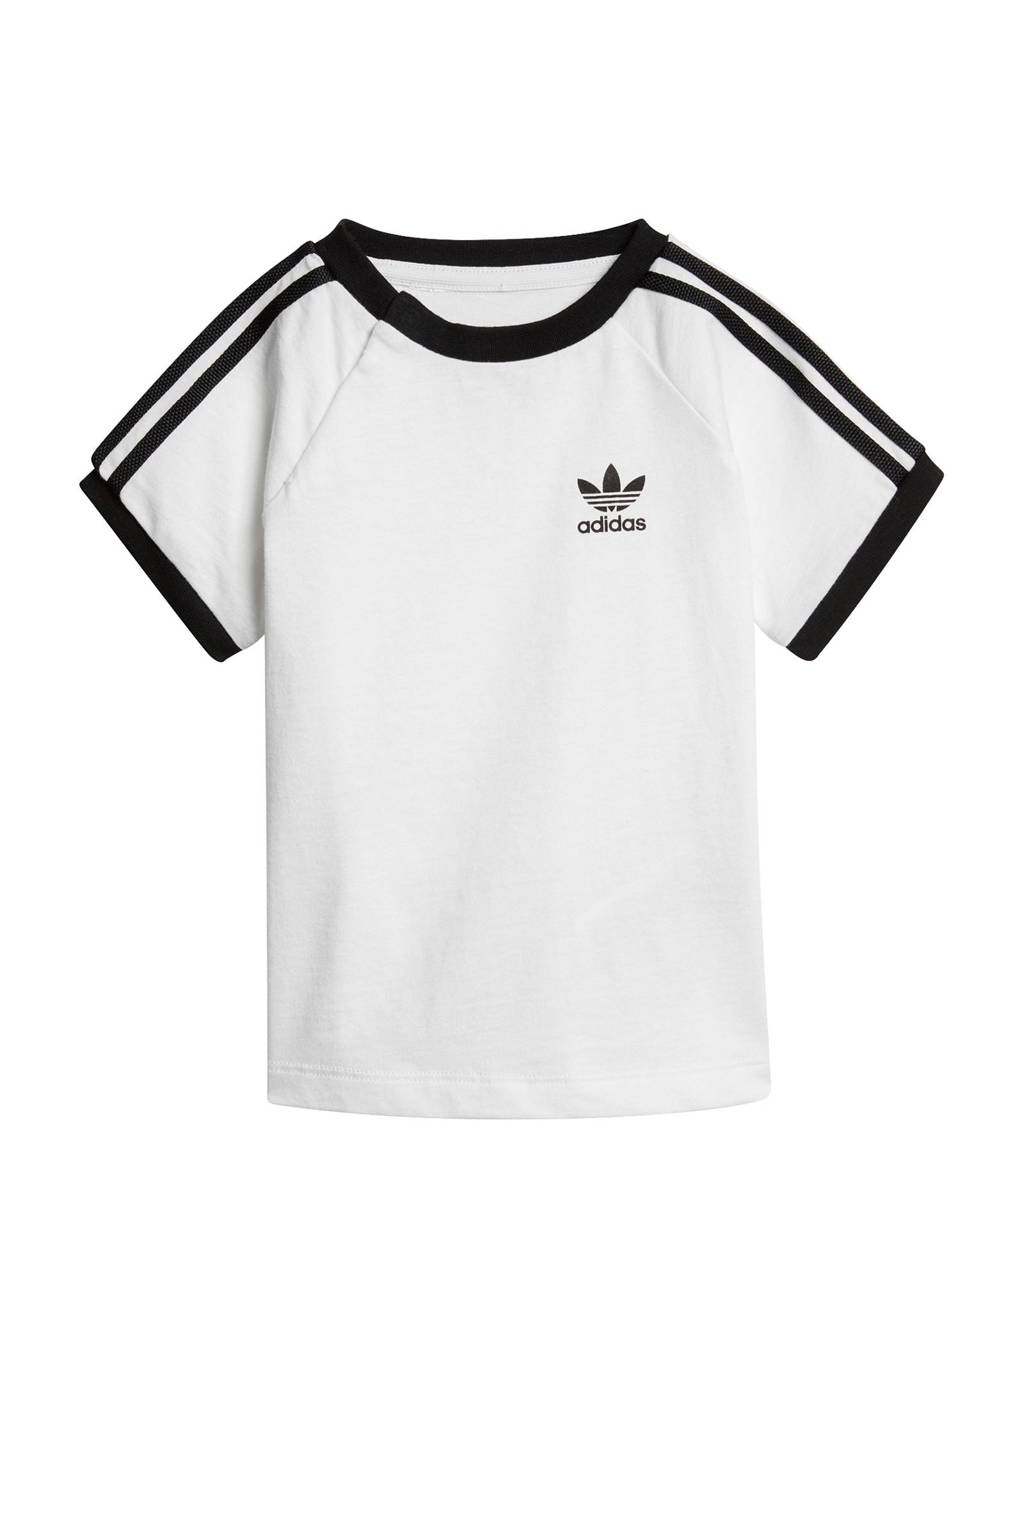 adidas originals Adicolor T-shirt wit, Wit/zwart